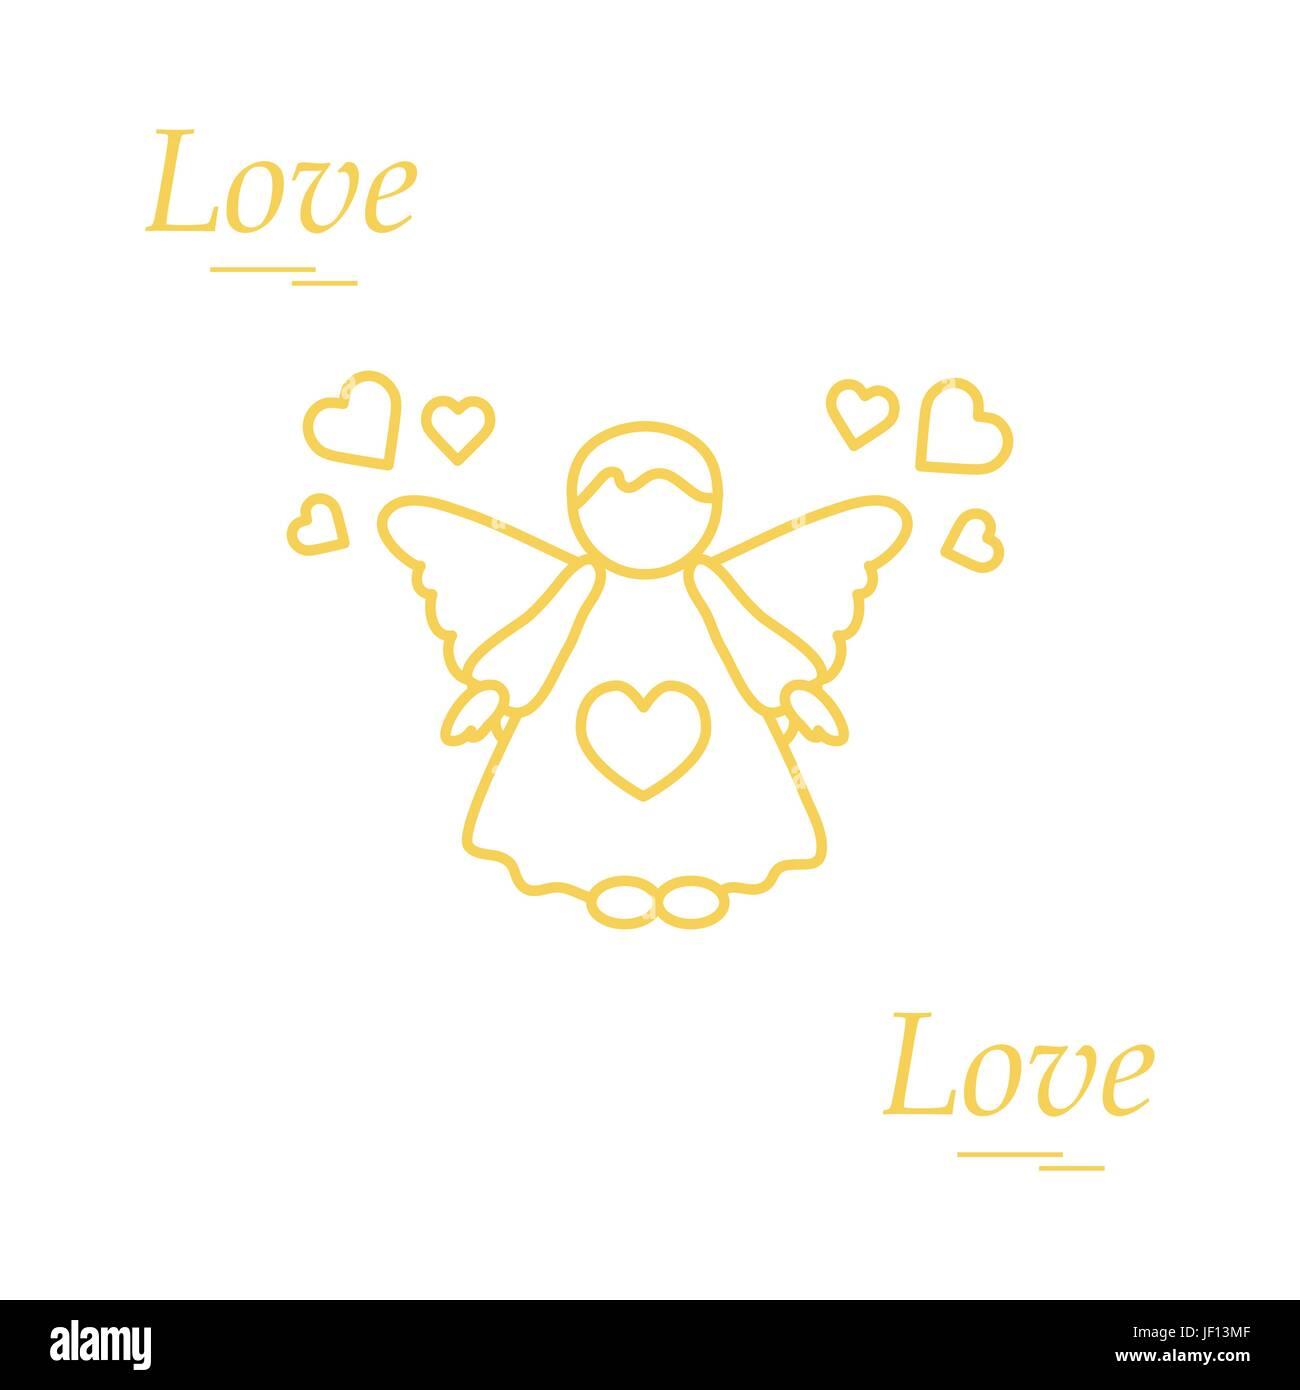 Cute Vector Illustration Angel And Hearts Love Symbol Design For Banner Flyer